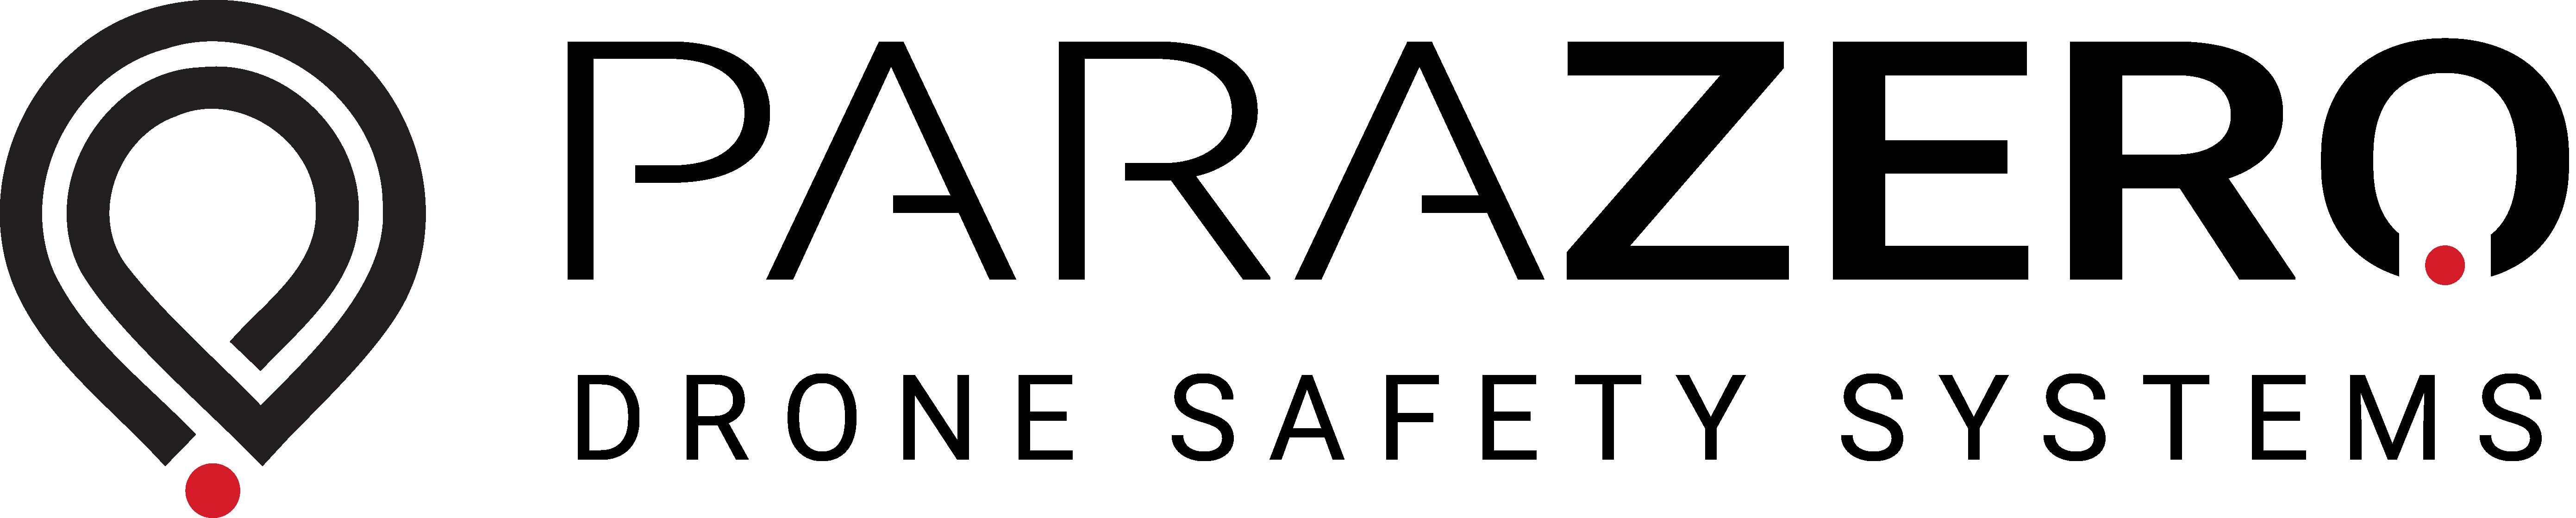 parazero-logo-final